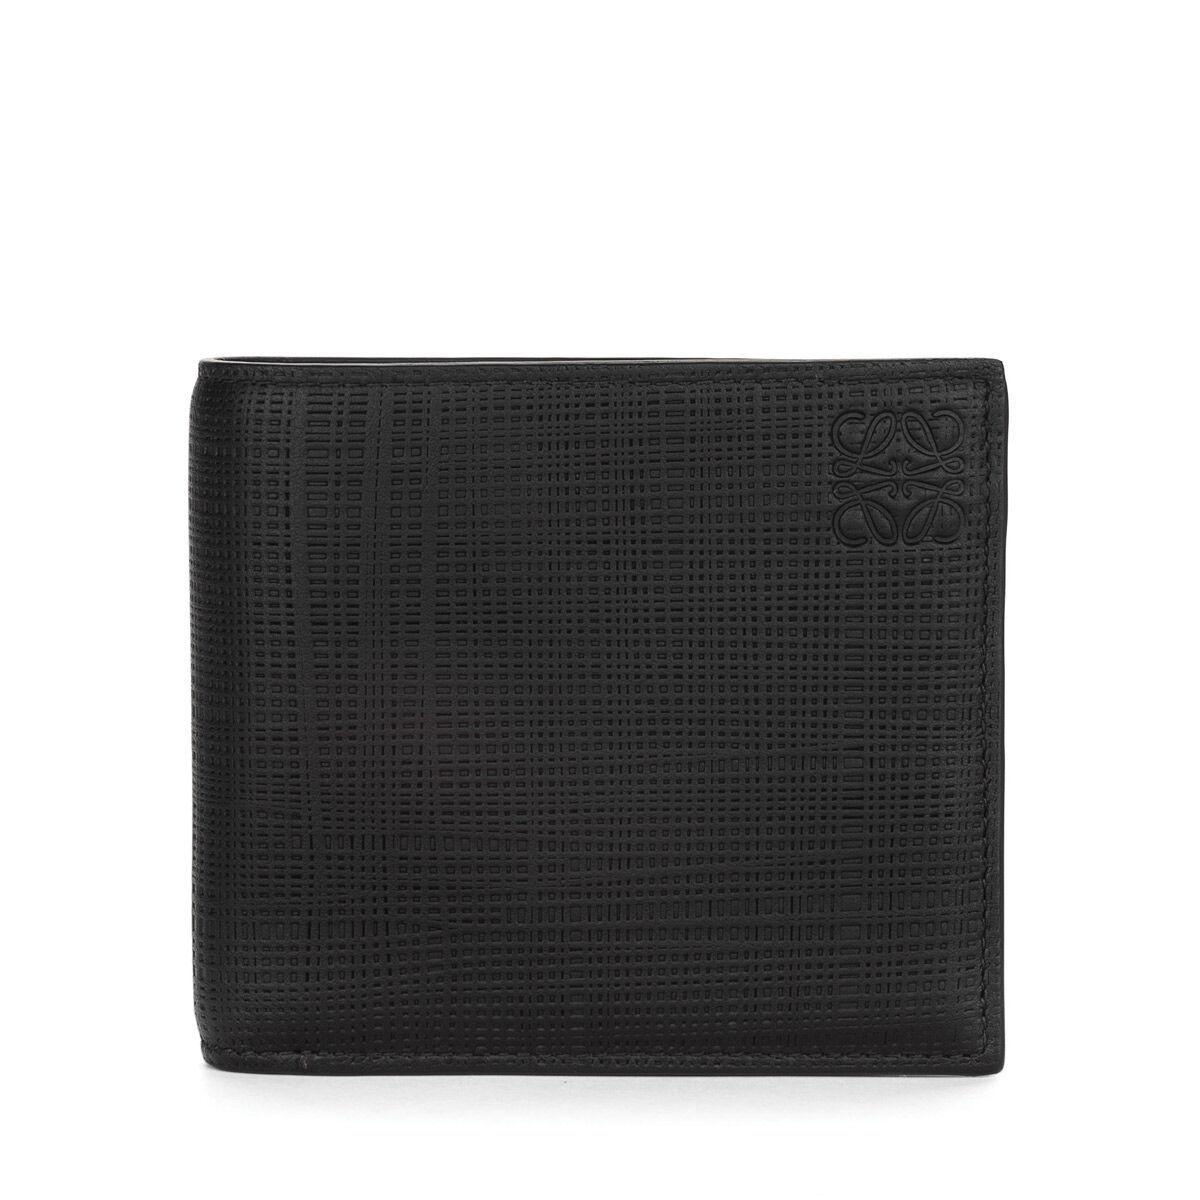 LOEWE Bifold/Coin Wallet Black all